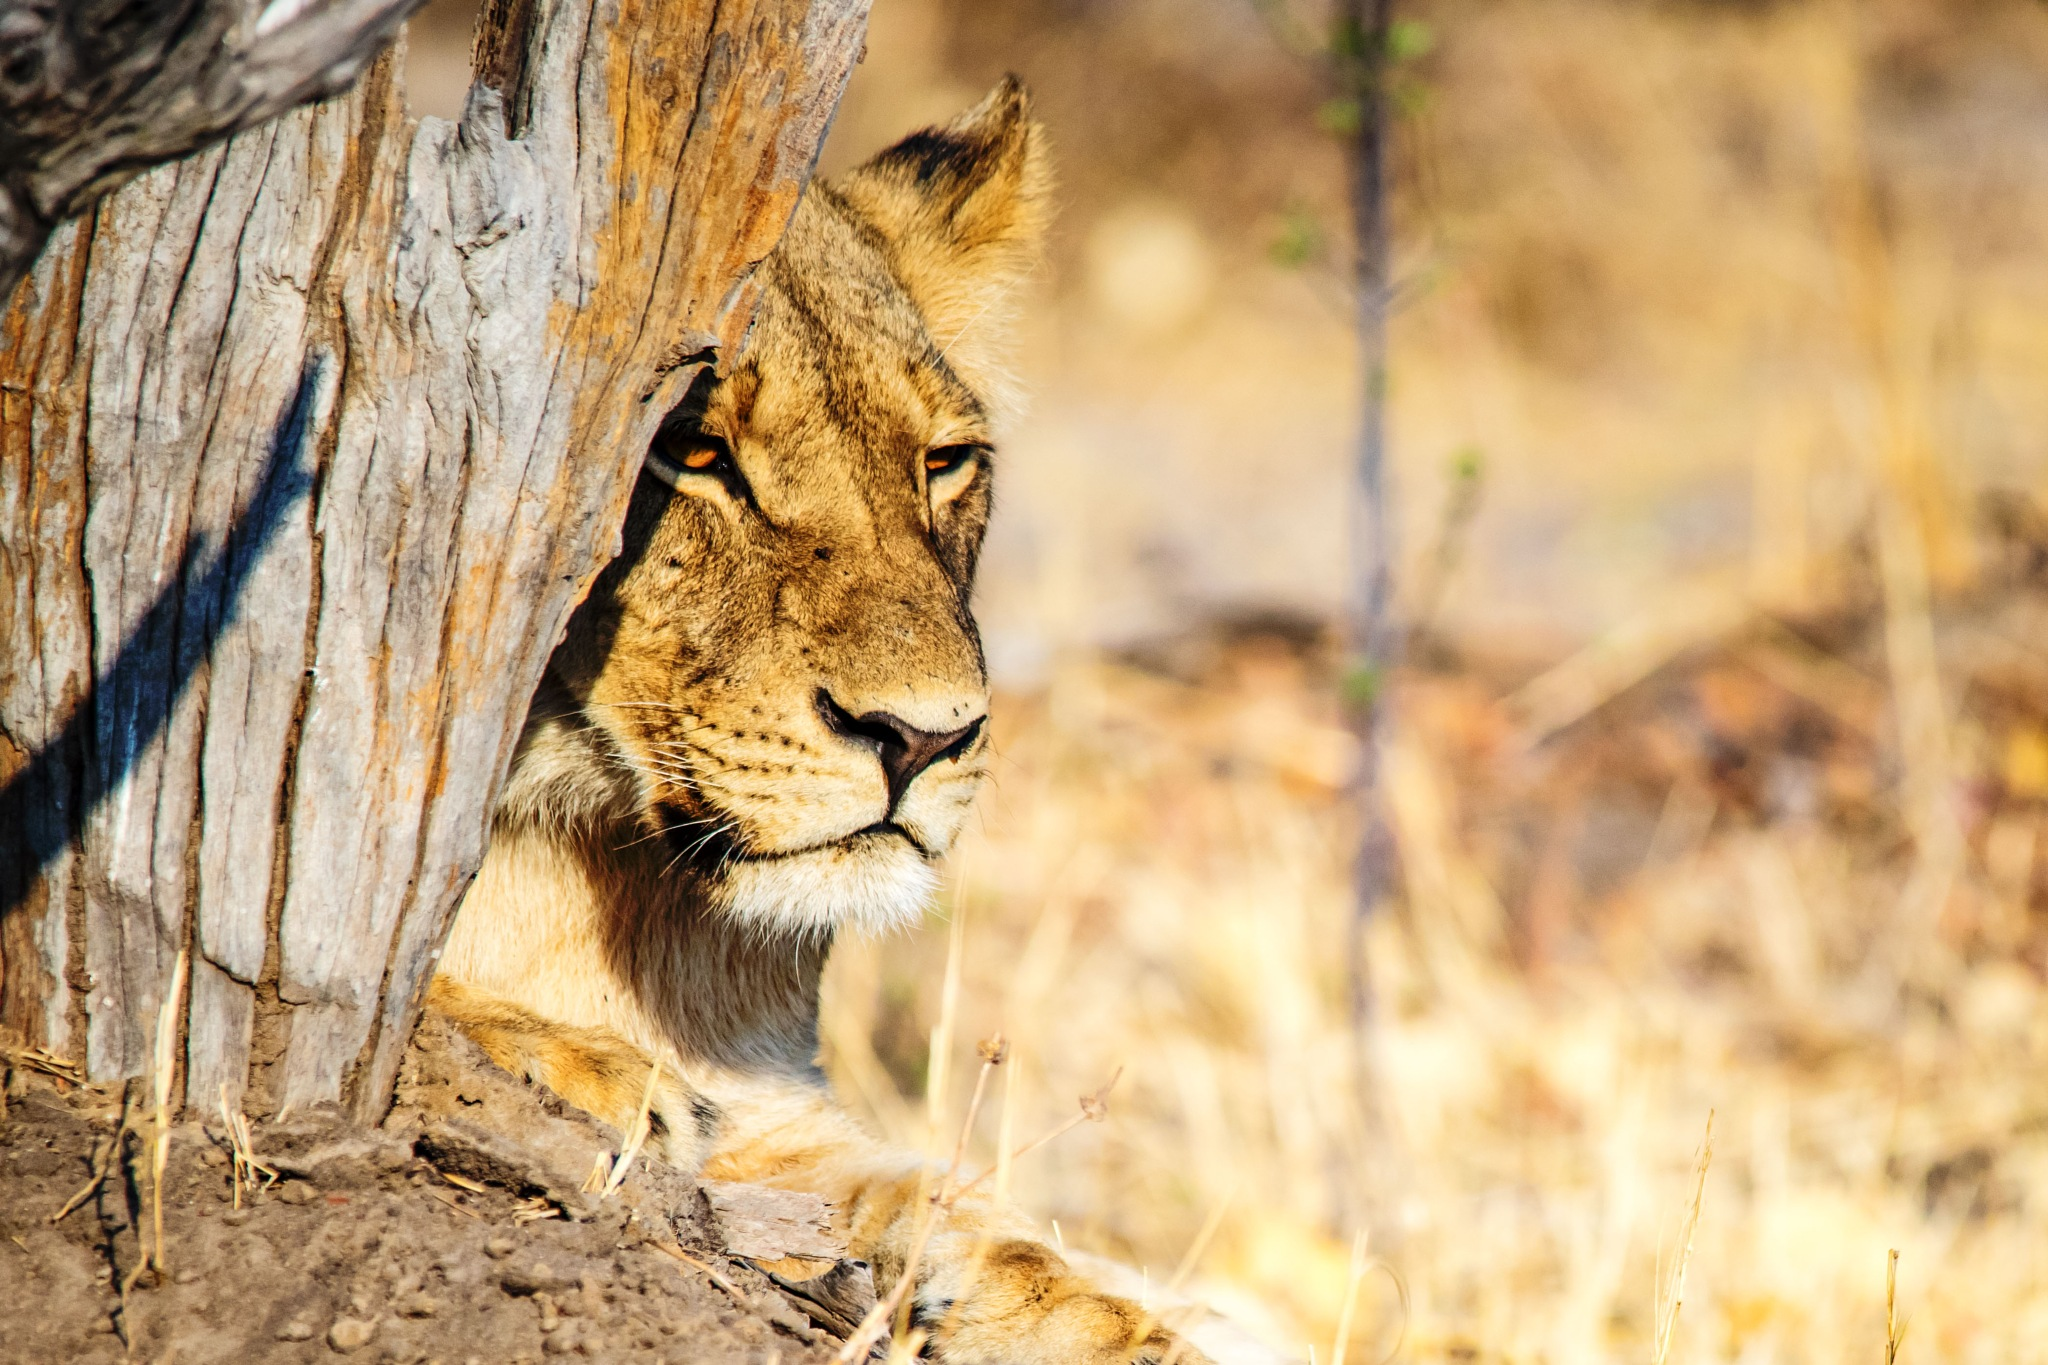 Löwenweibchen - Lion female by Fotomotions